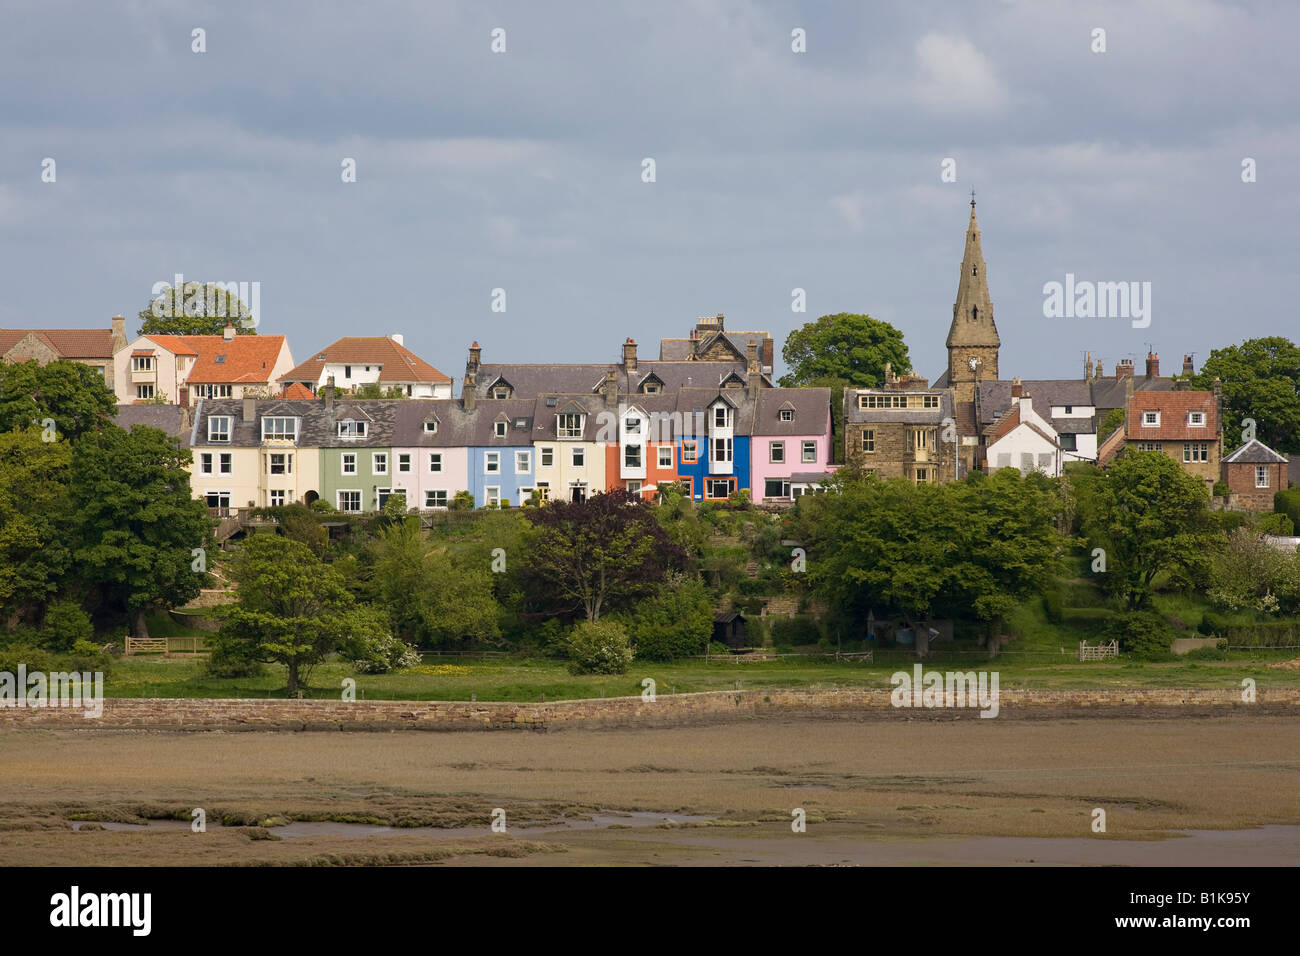 Alnmouth Northumbria - Stock Image